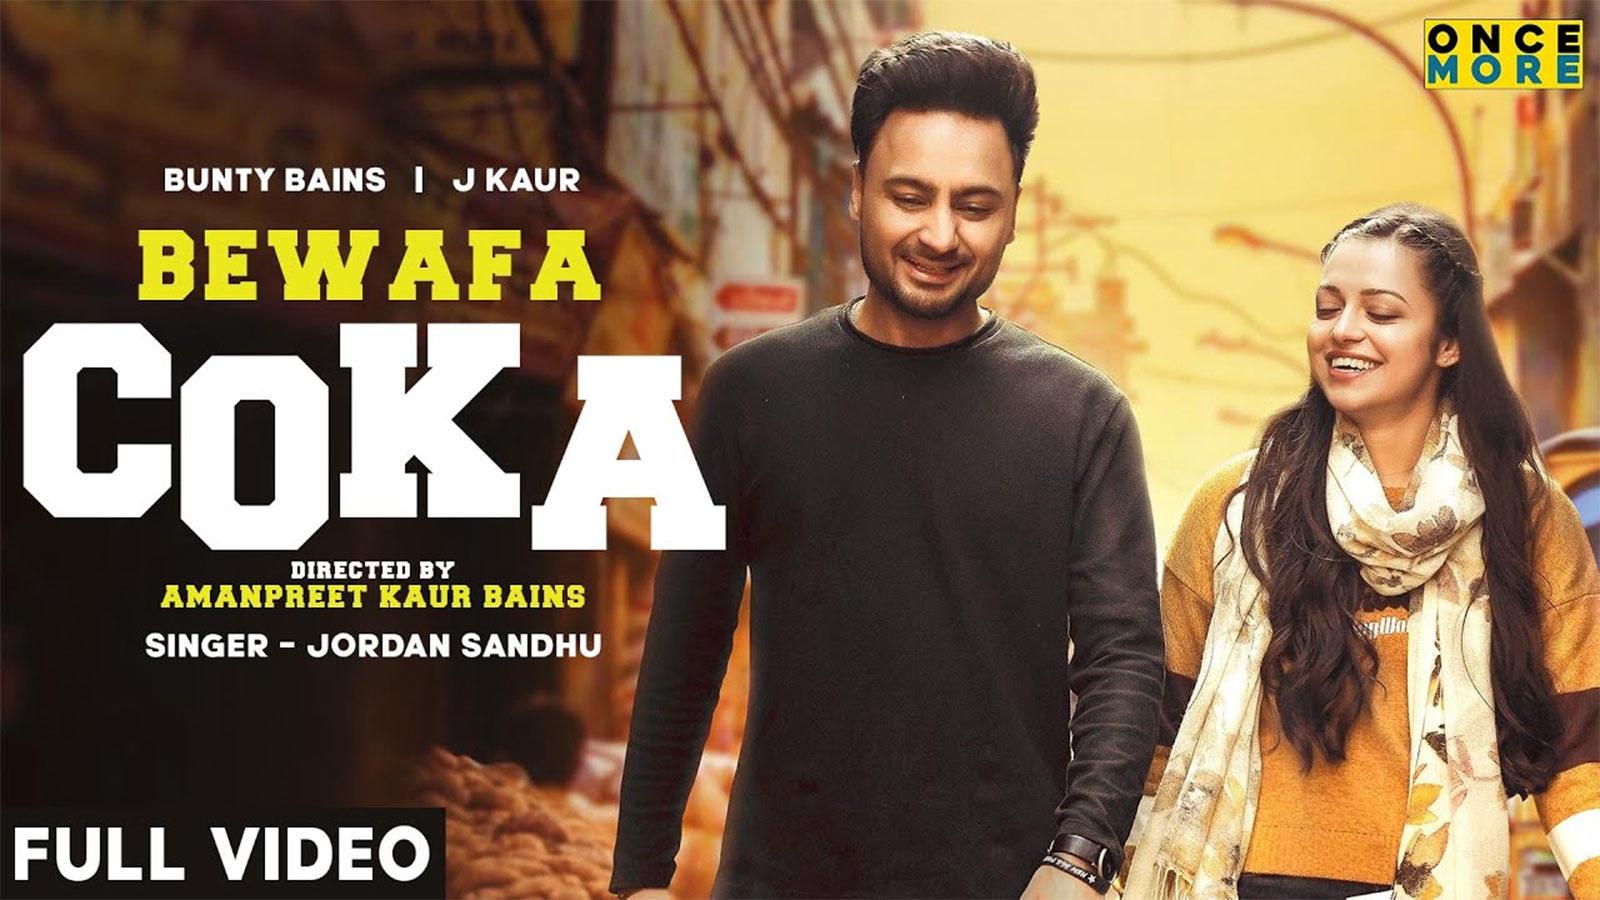 Watch New 2020 Punjabi Song 'Bewafa Coka' Sung By Jordan Sandhu | Punjabi  Video Songs - Times of India